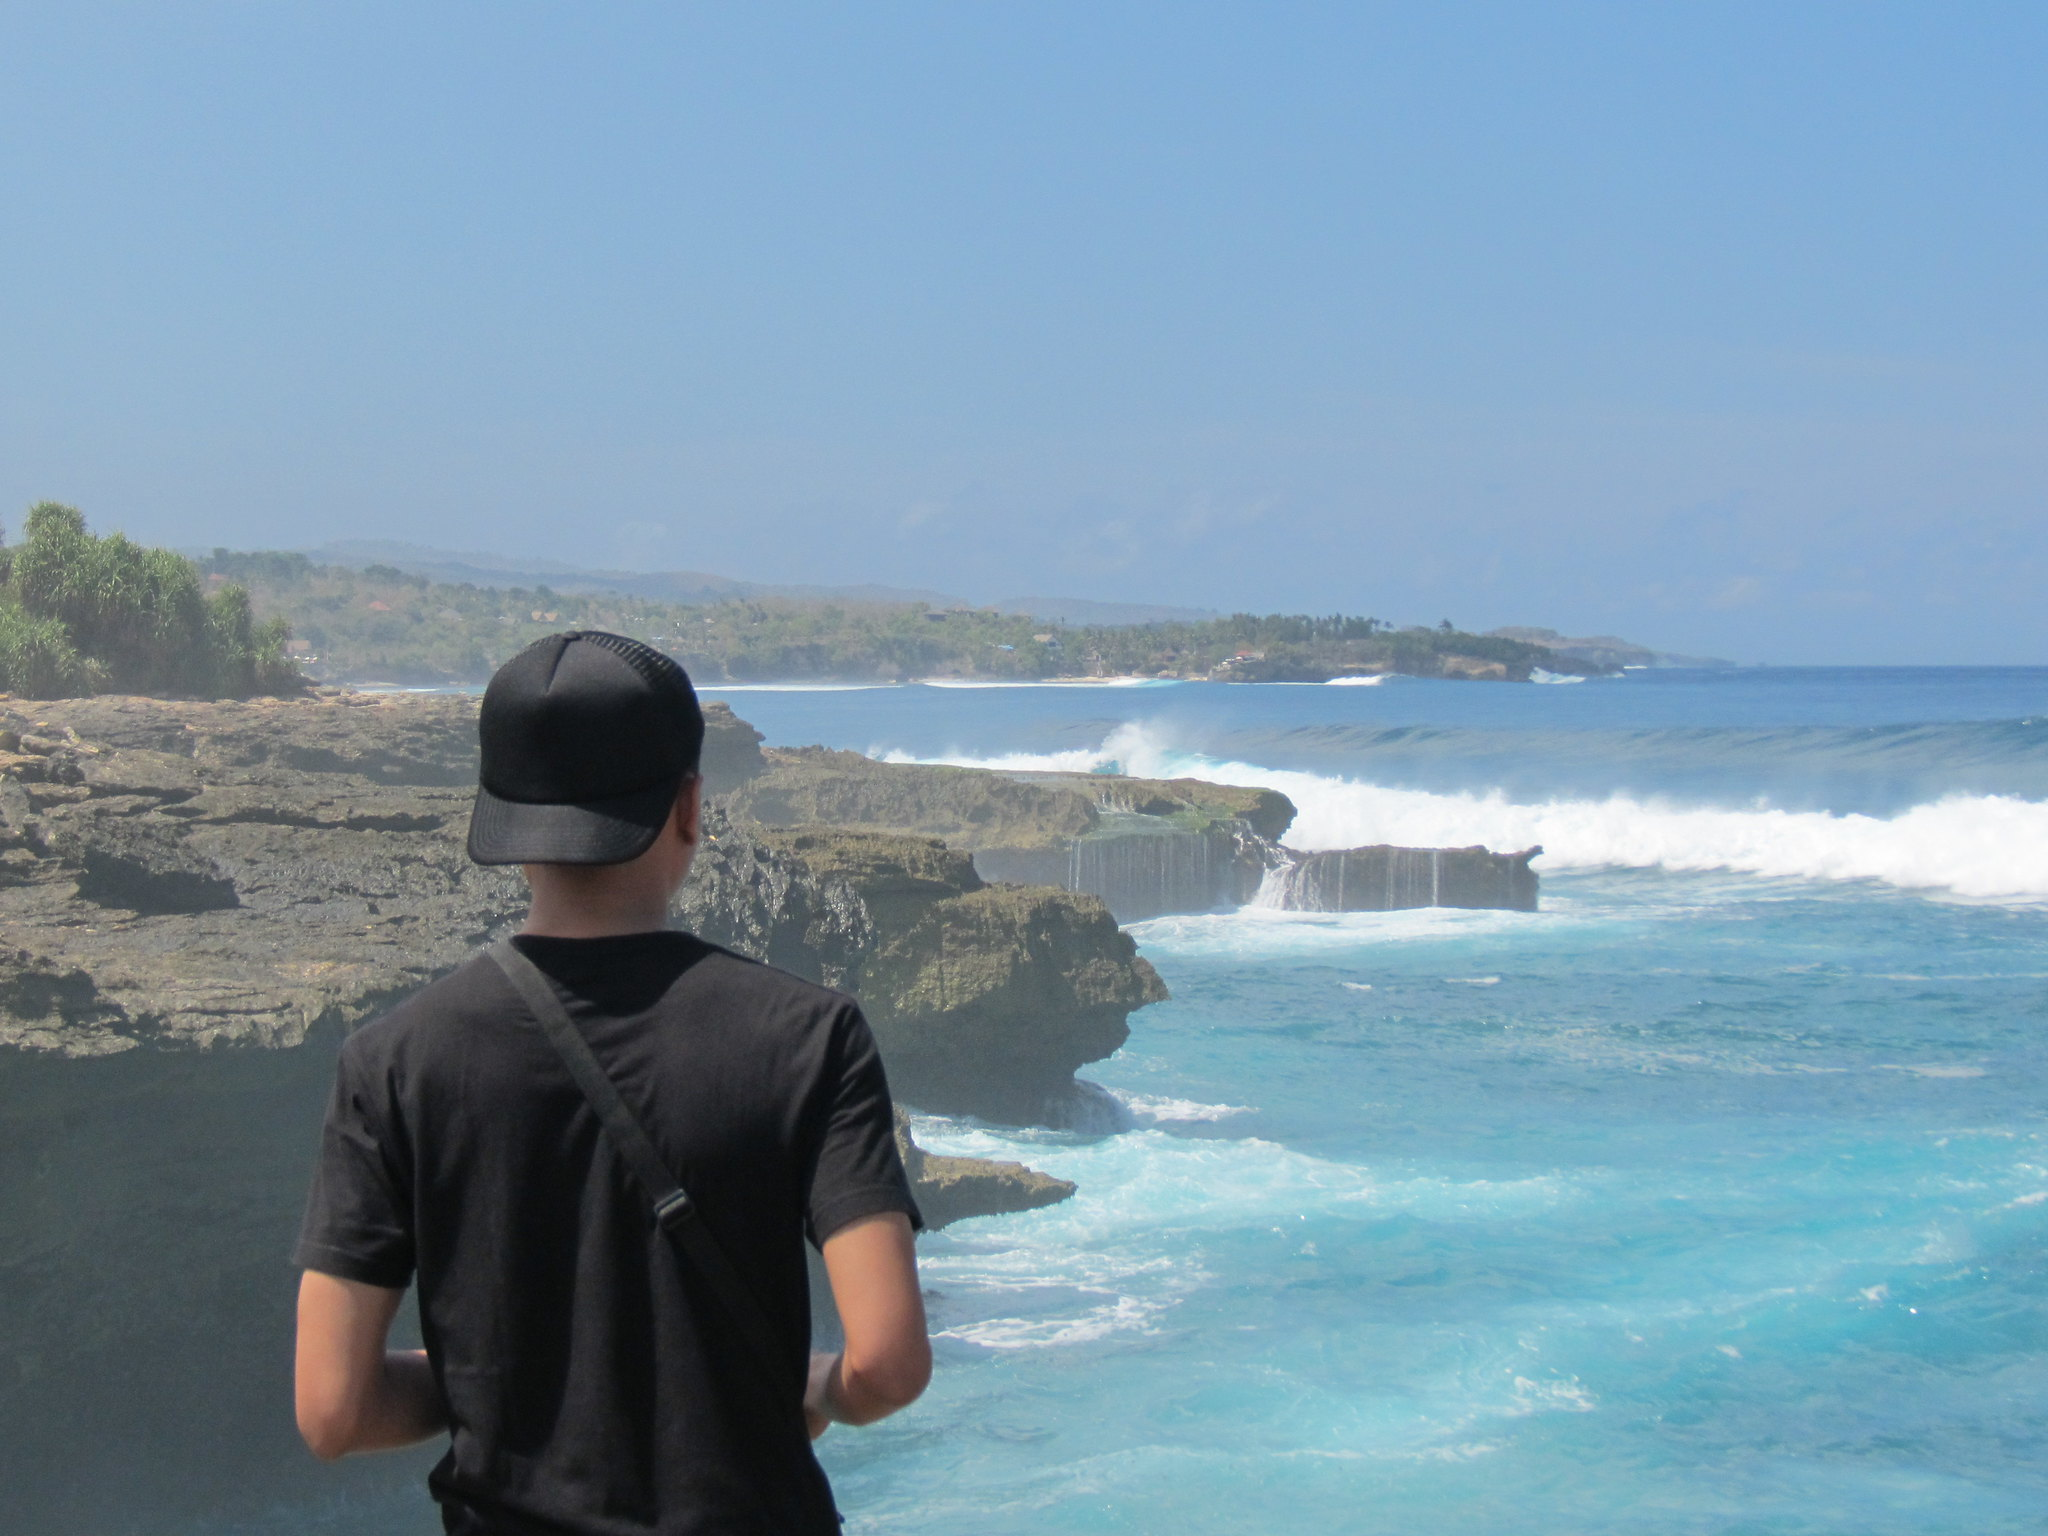 Kabur ke Nusa Lembongan 8